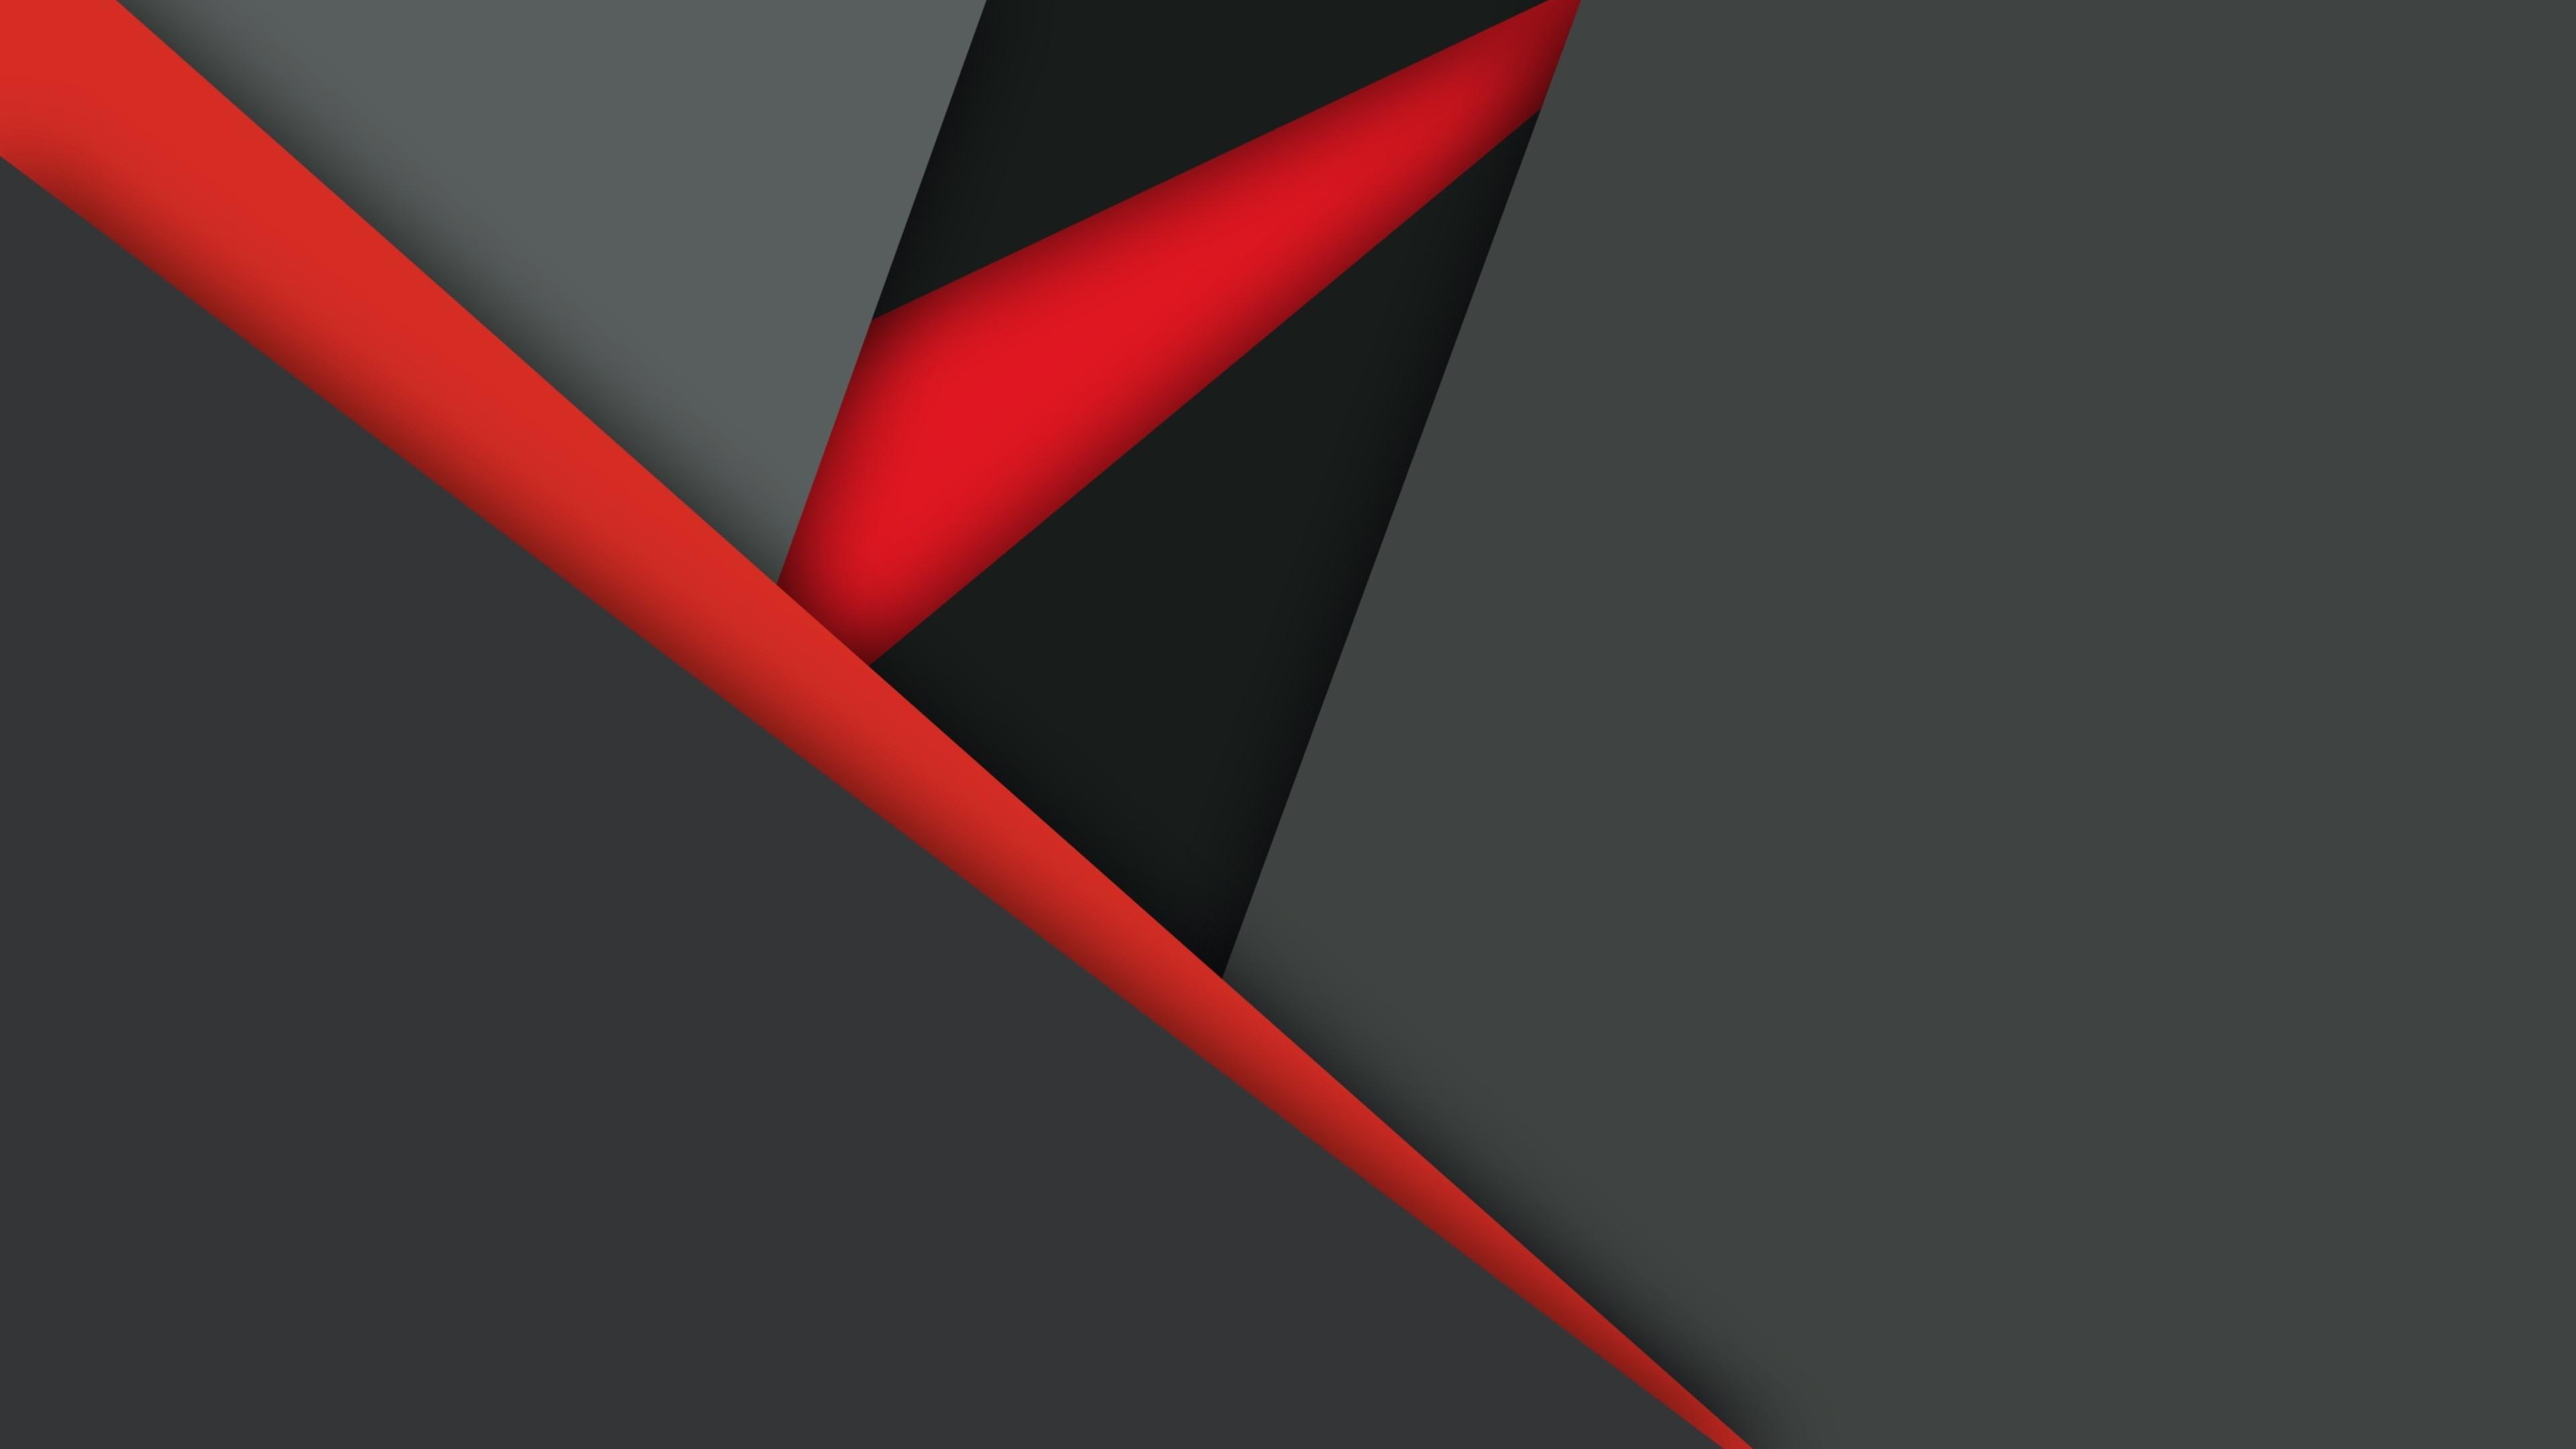 3840x2160 material design dark red black 4k hd 4k wallpapers images backgrounds photos and. Black Bedroom Furniture Sets. Home Design Ideas